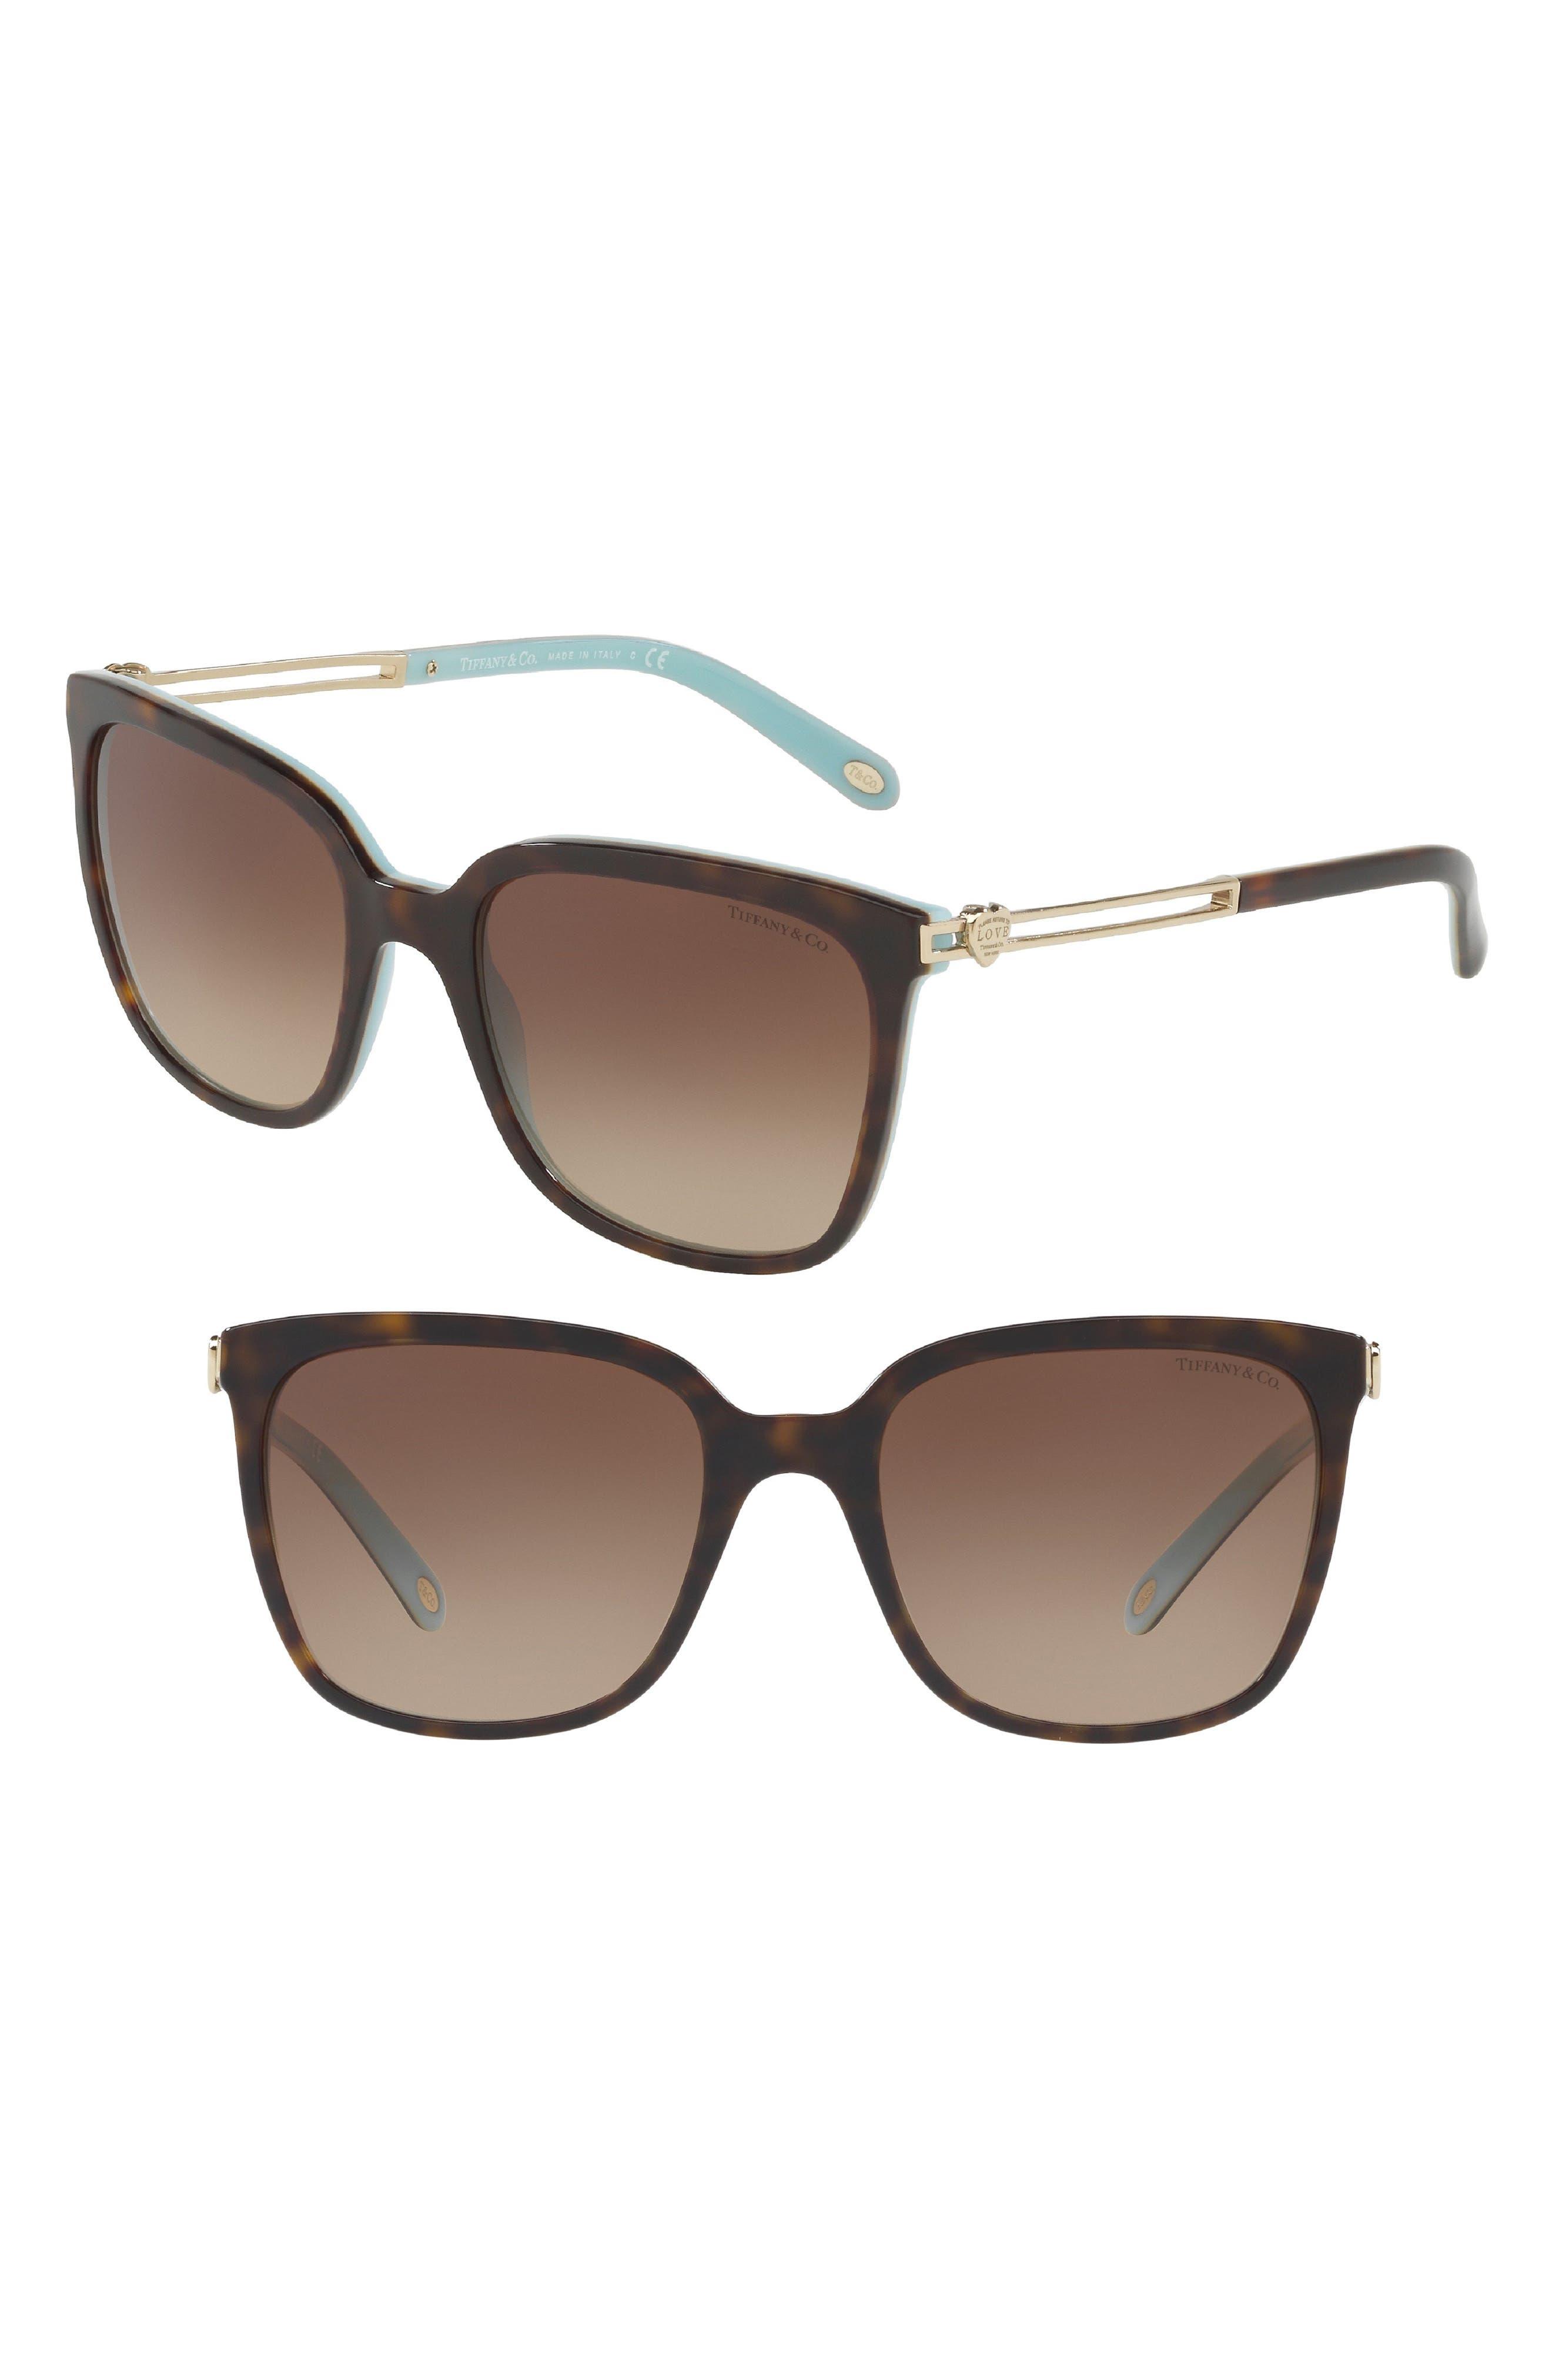 Tiffany 54mm Sunglasses,                             Main thumbnail 1, color,                             Havana Blue Gradient